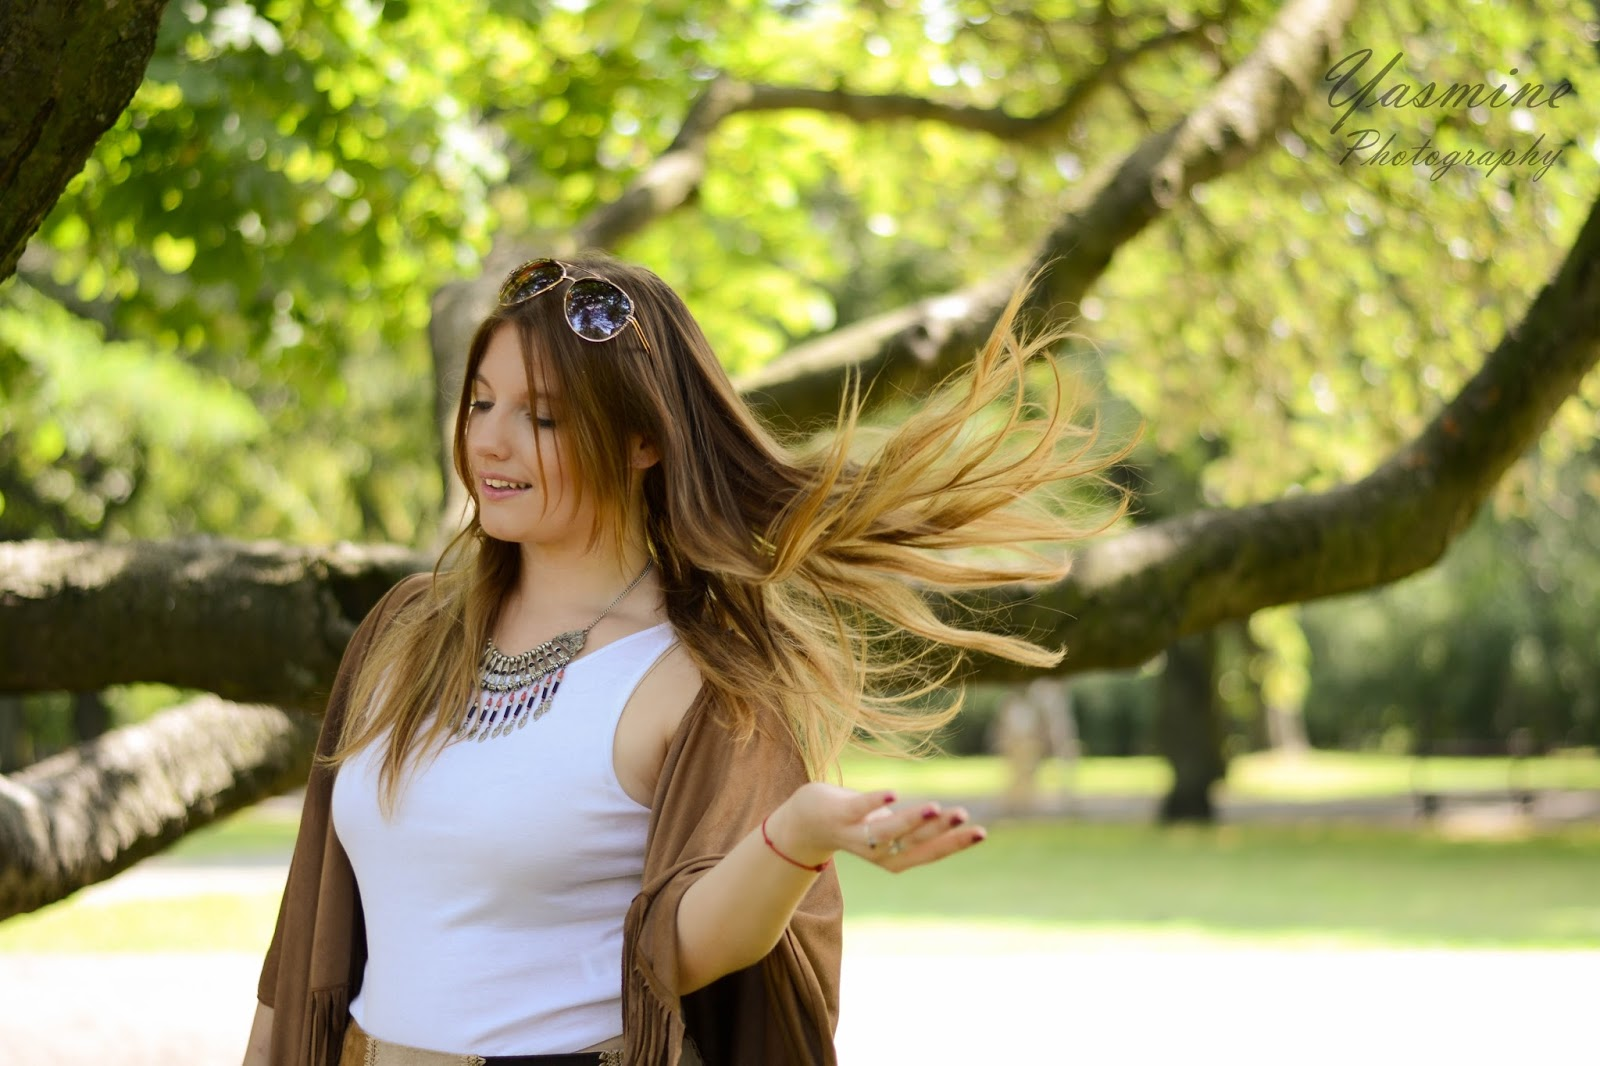 7 coachella boho style etno summer sommer festival indie jewellery stylizacja na festiwal festival coachella poland polish blogger sommer summer style fashion moda inspiration melodylaniella hair moda